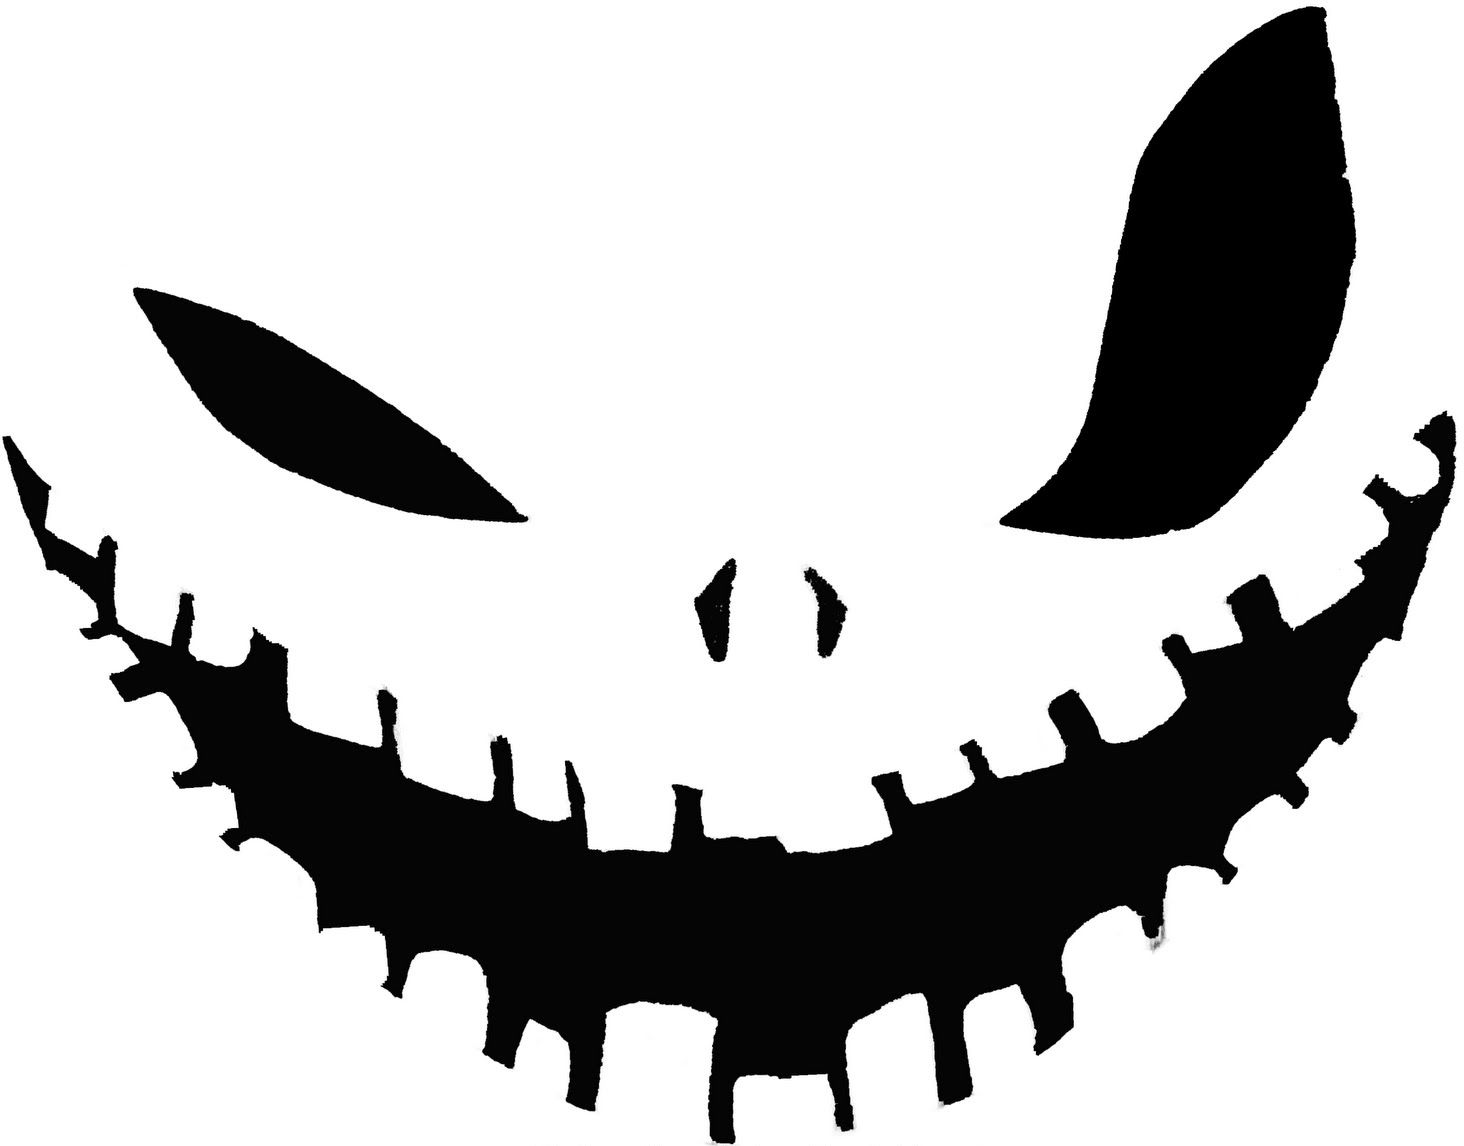 Jack o lantern free patterns - 1000 Images About Halloween On Pinterest Stencils Halloween Pumpkin Stencils And Pumpkin Faces